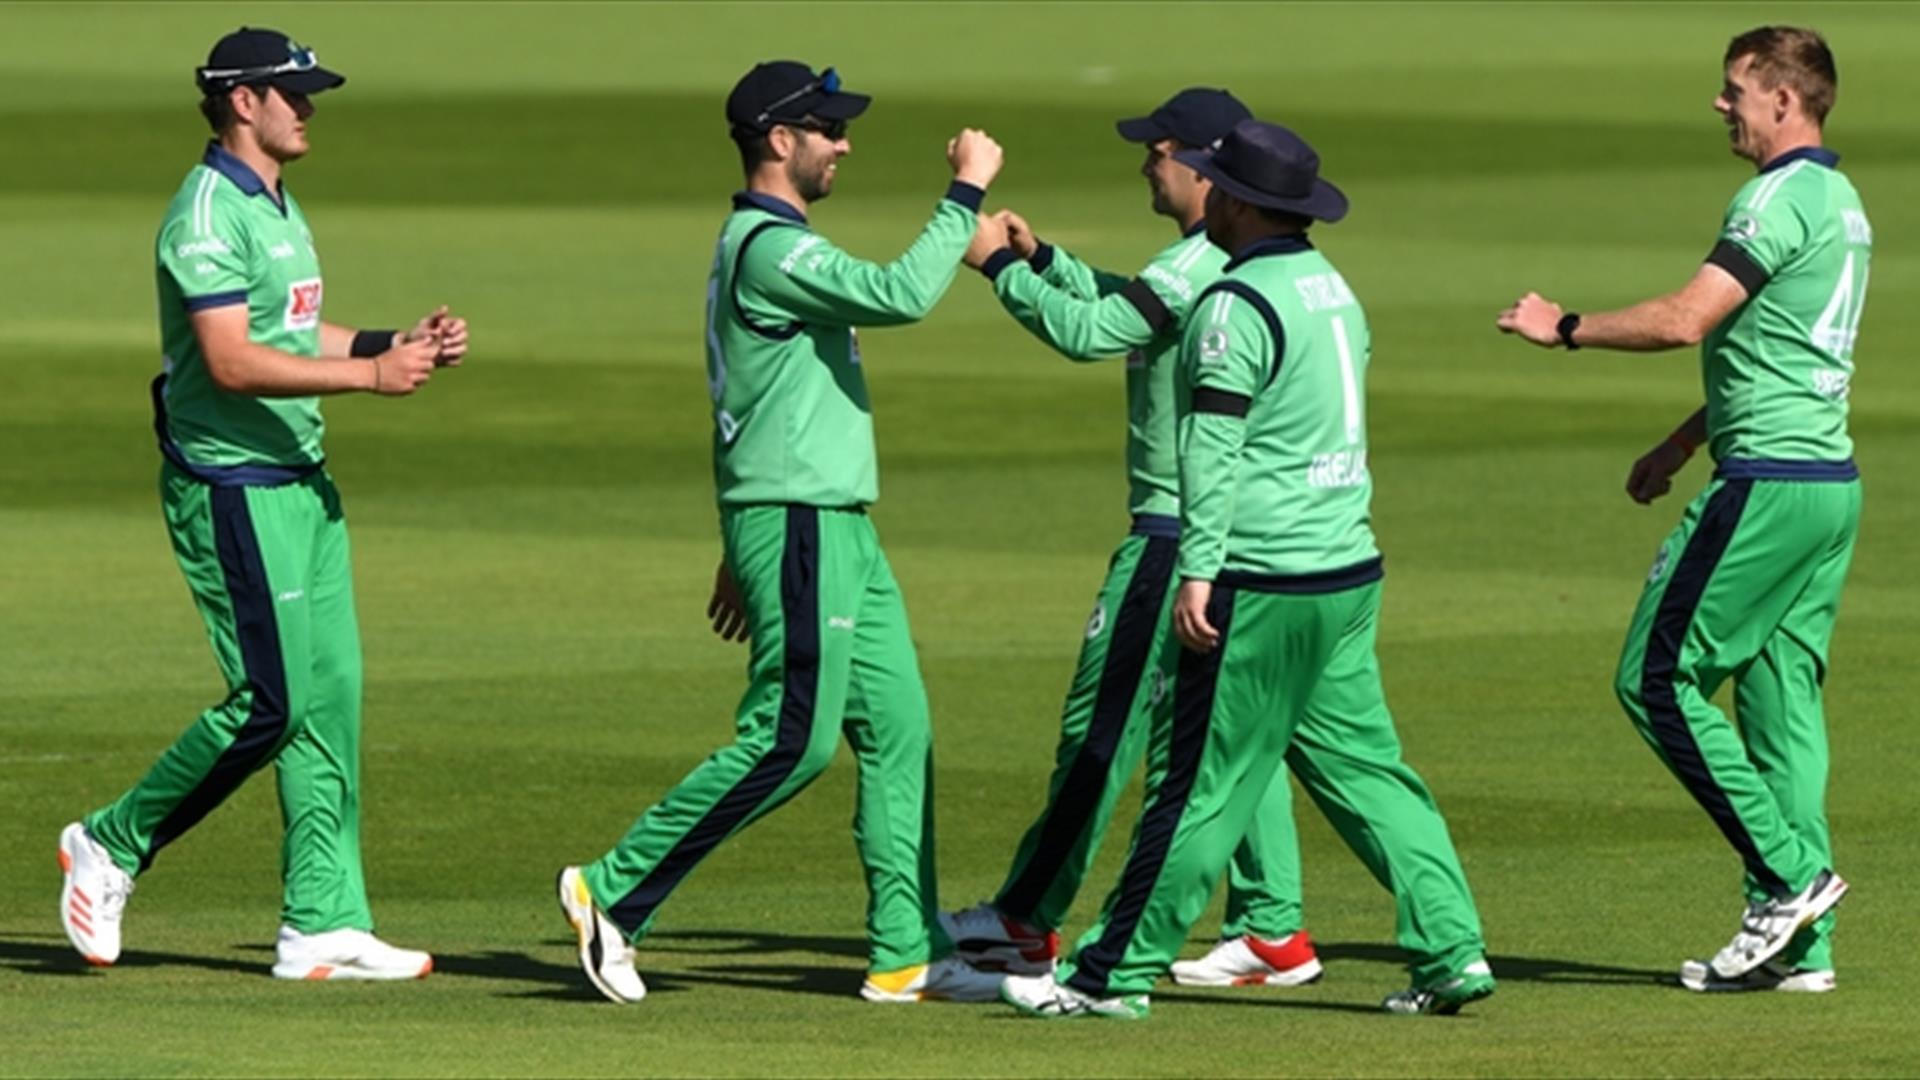 Cricket Twenty20 series